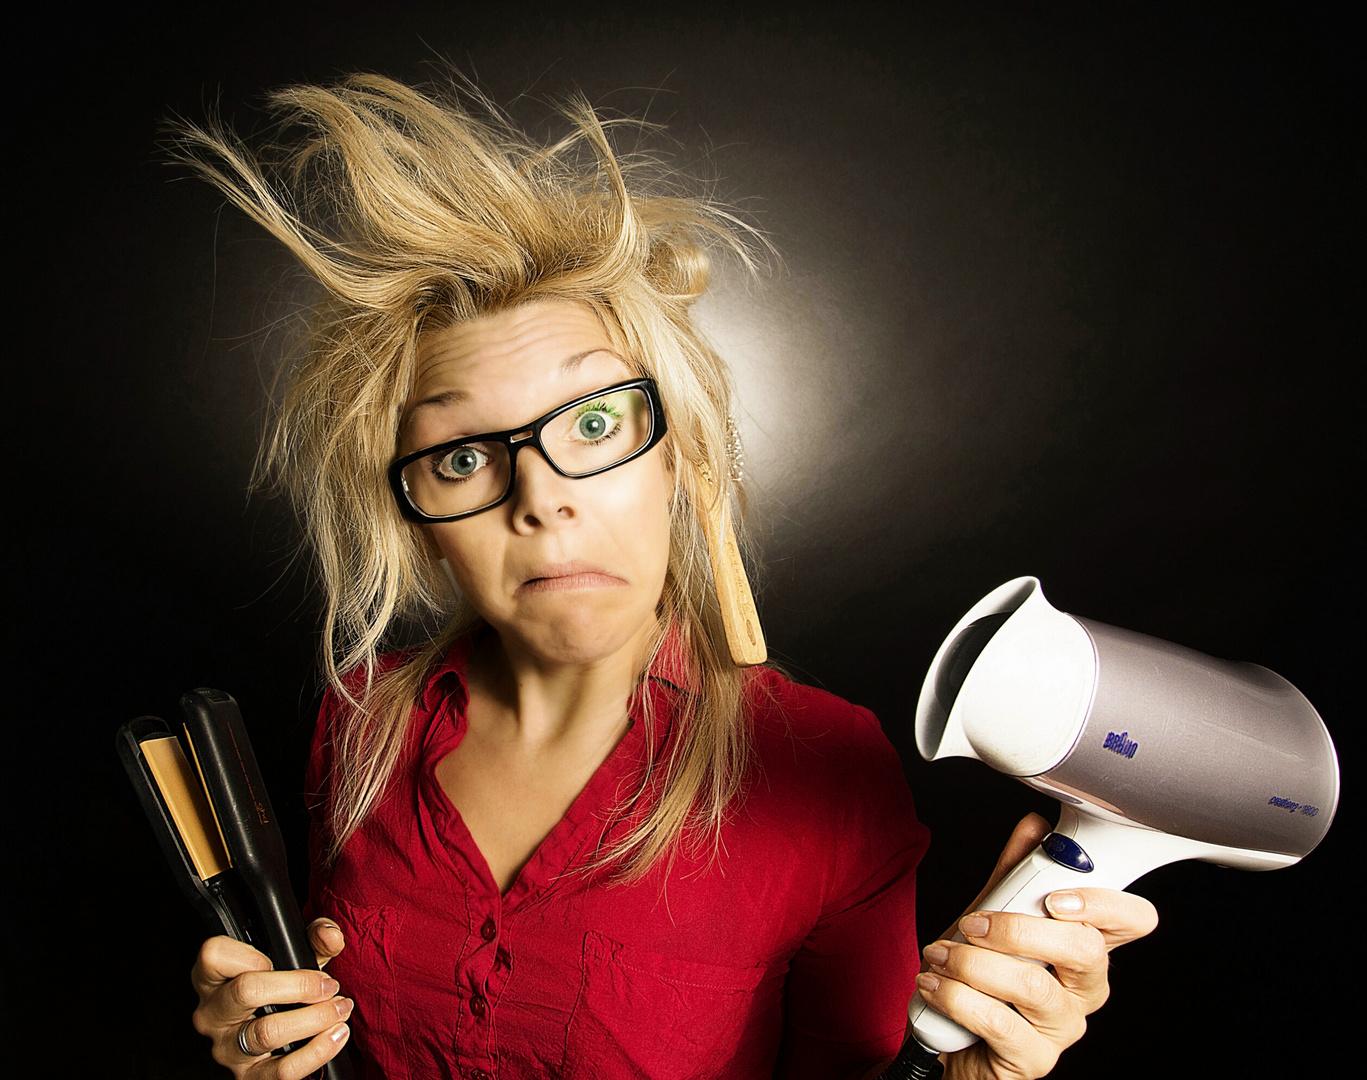 bad hair day.......